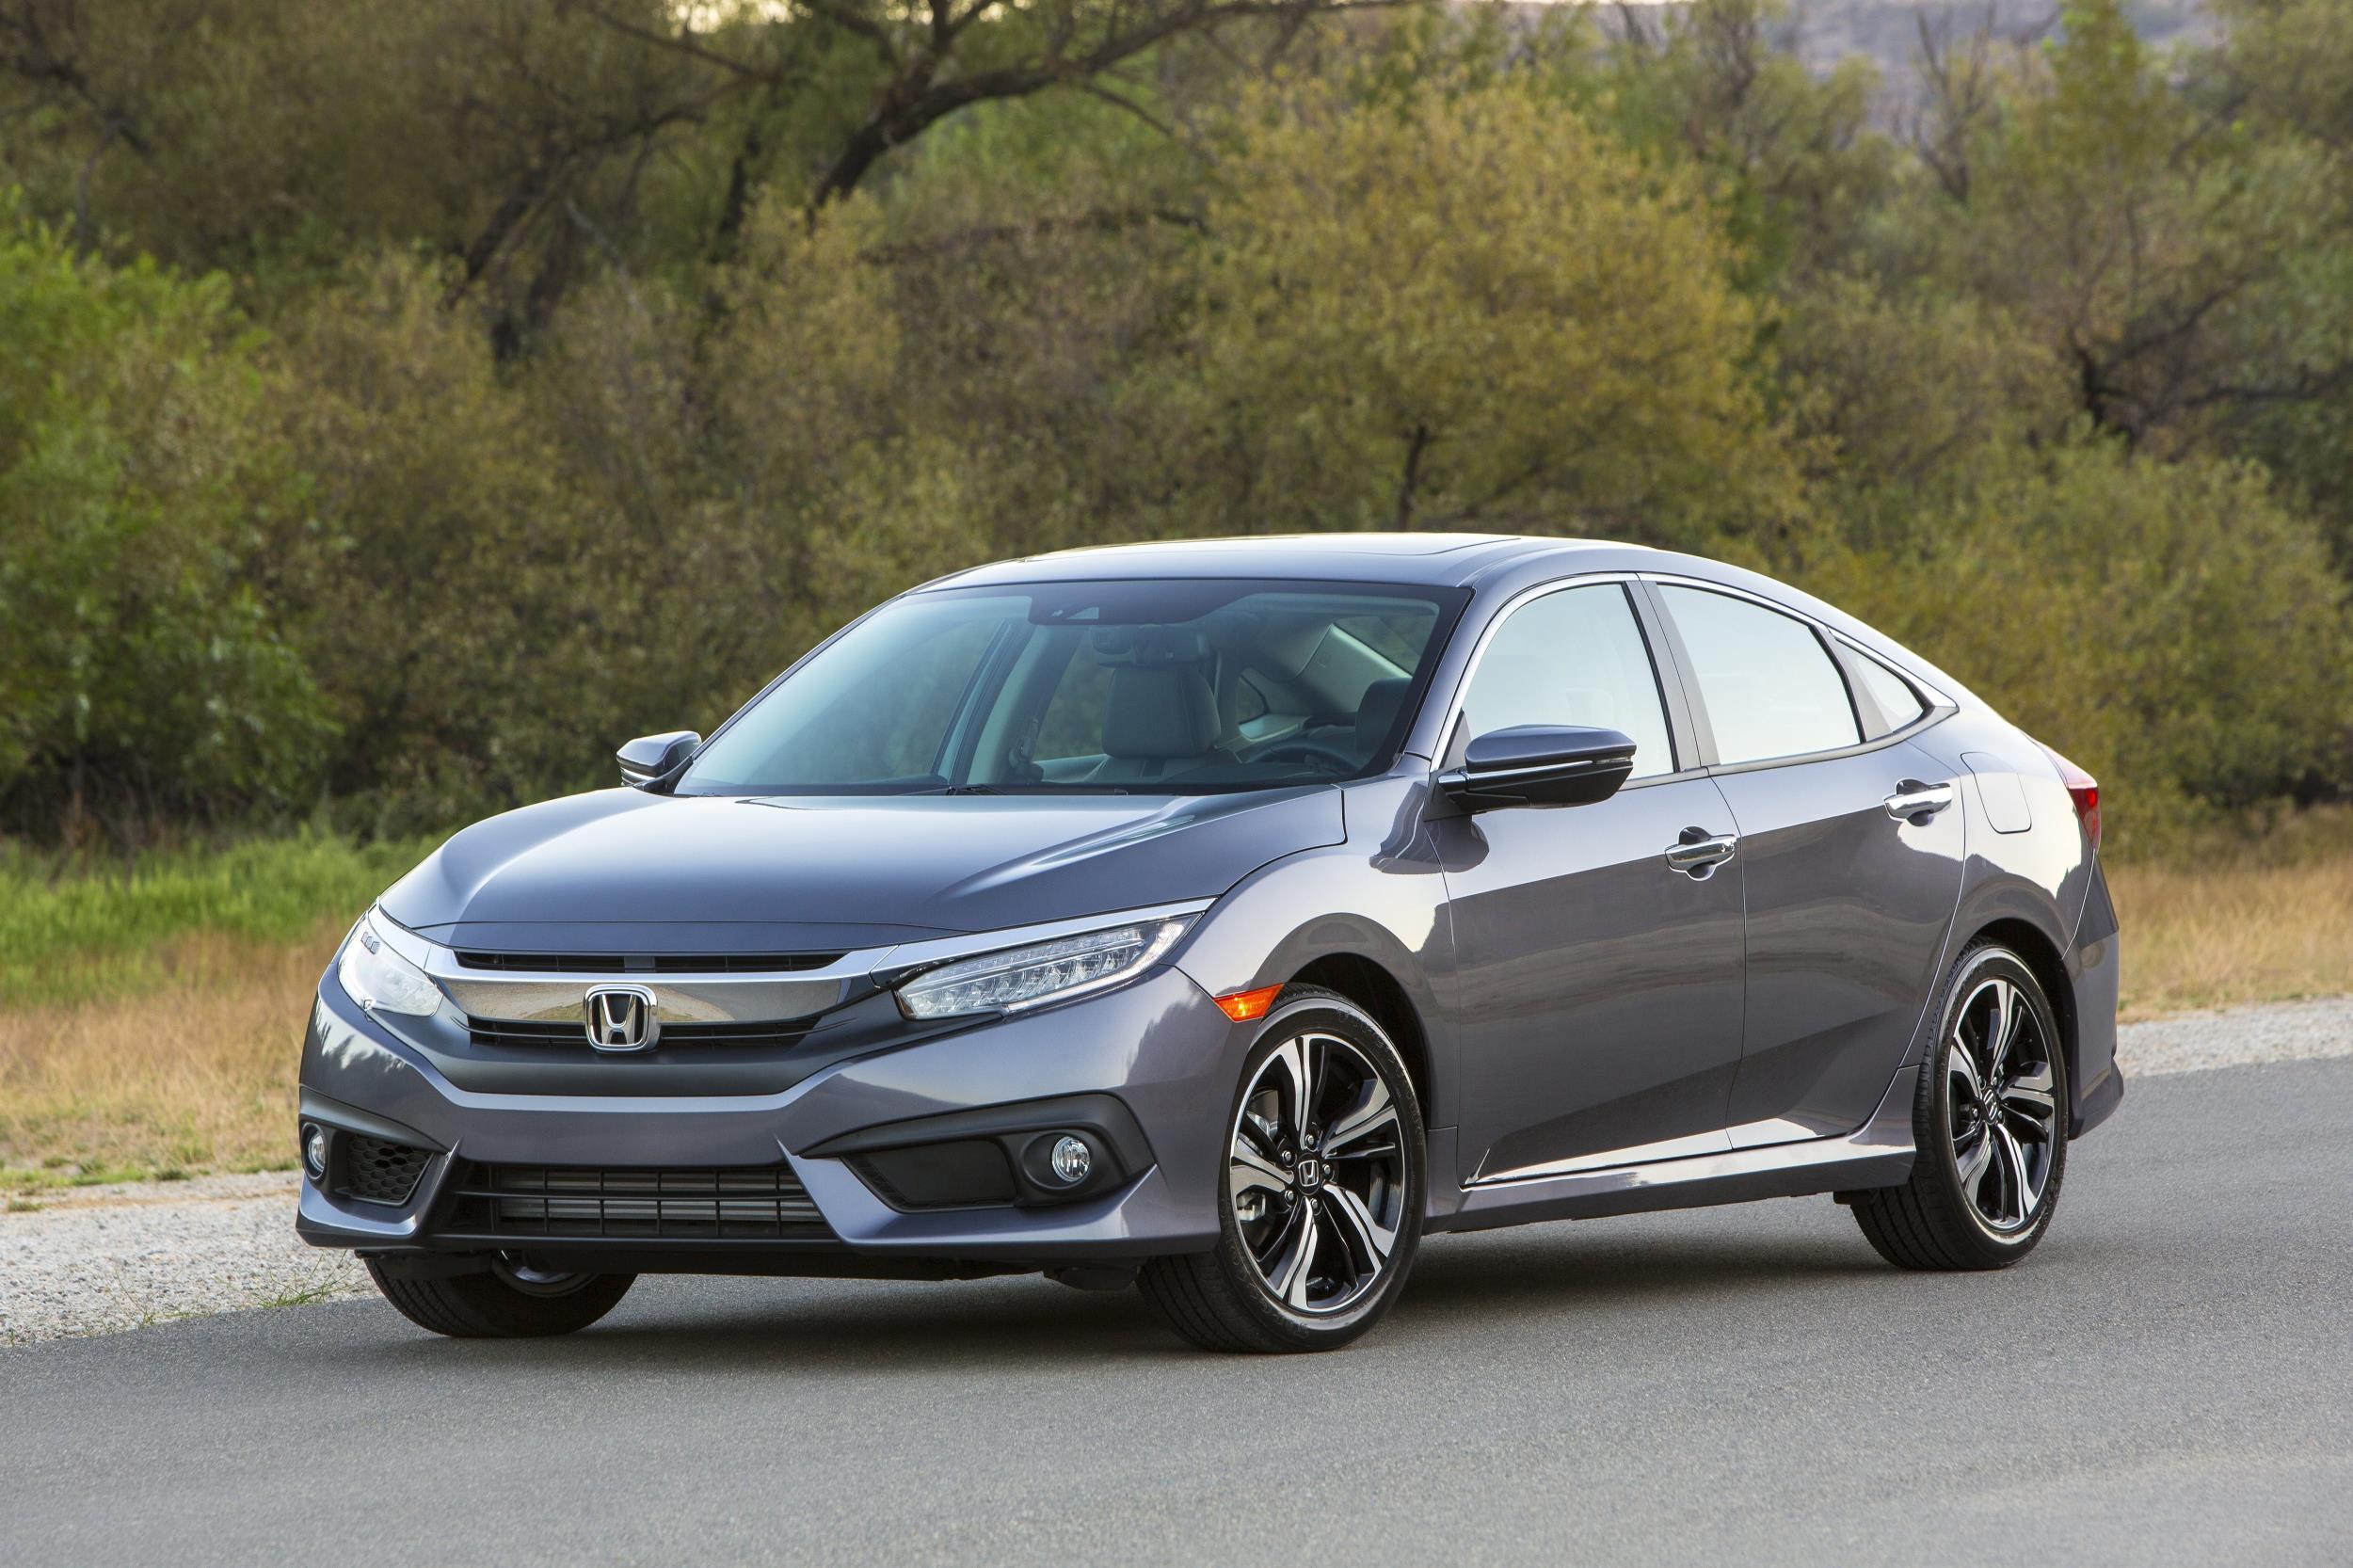 Honda Civic, one of Honda's top selling vehicles in calendar year 2017